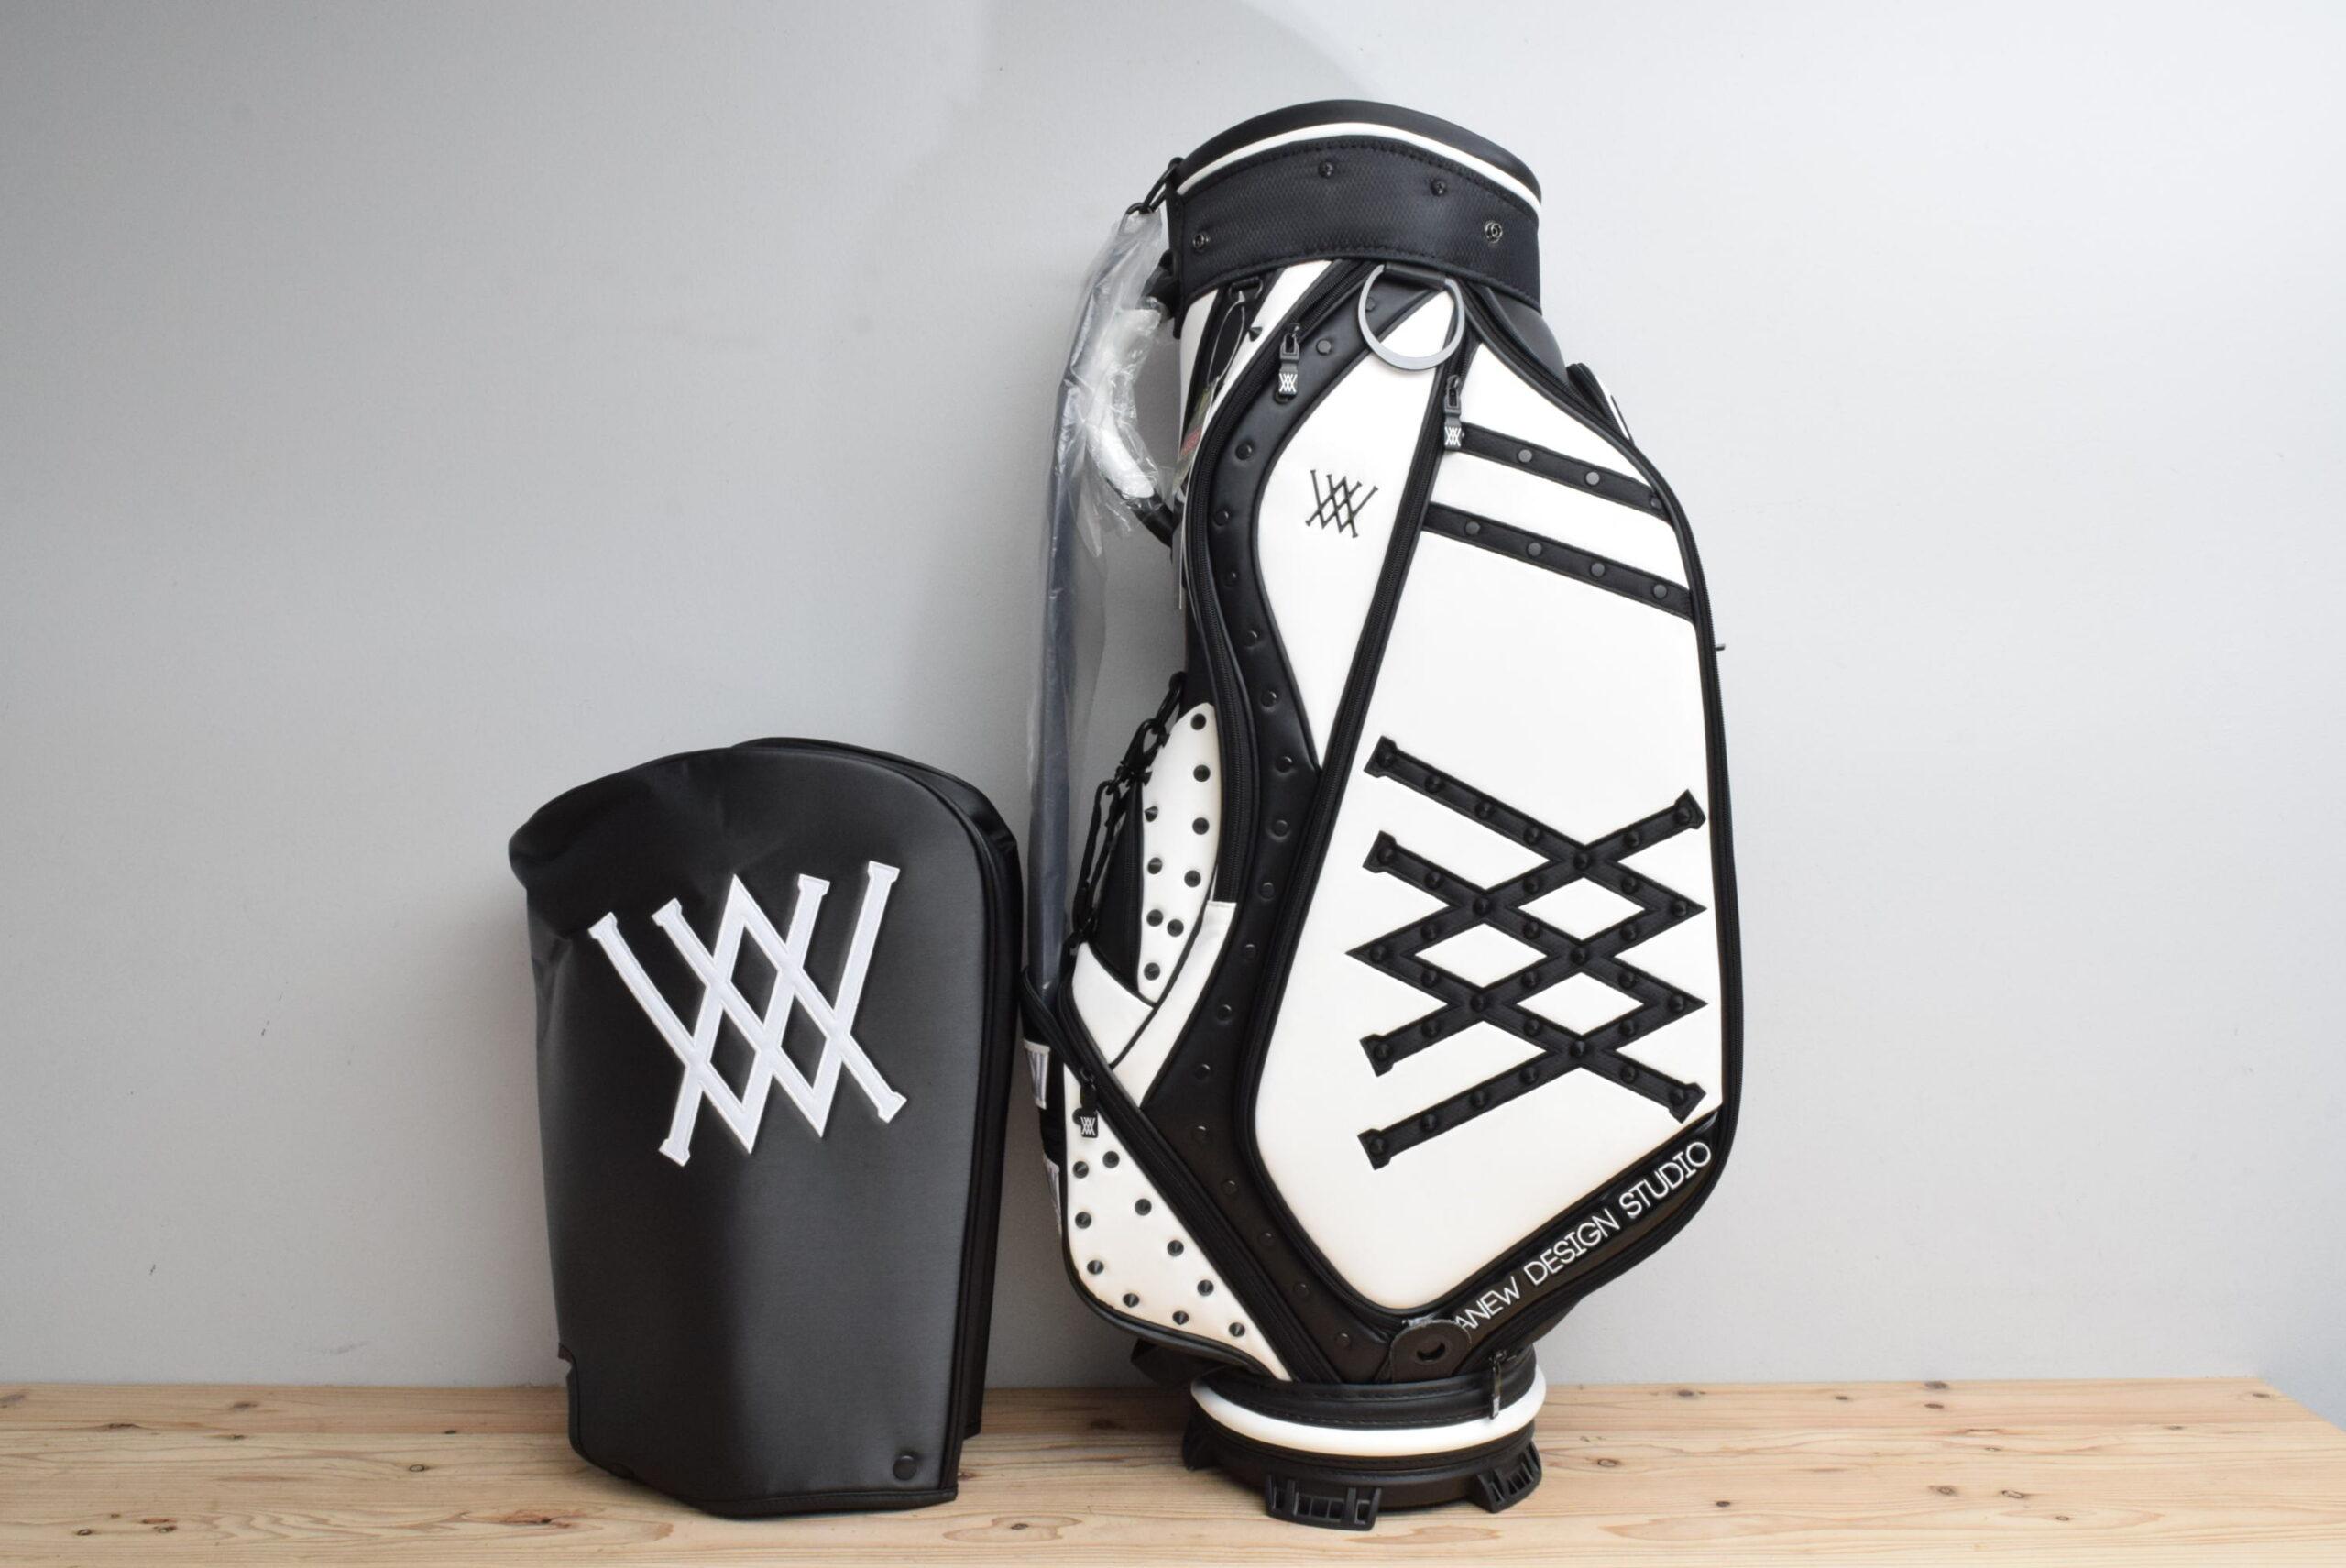 Azas Golf アザスゴルフ アニュー MID スタッフ キャディバッグ ホワイト/ブラック 2020年